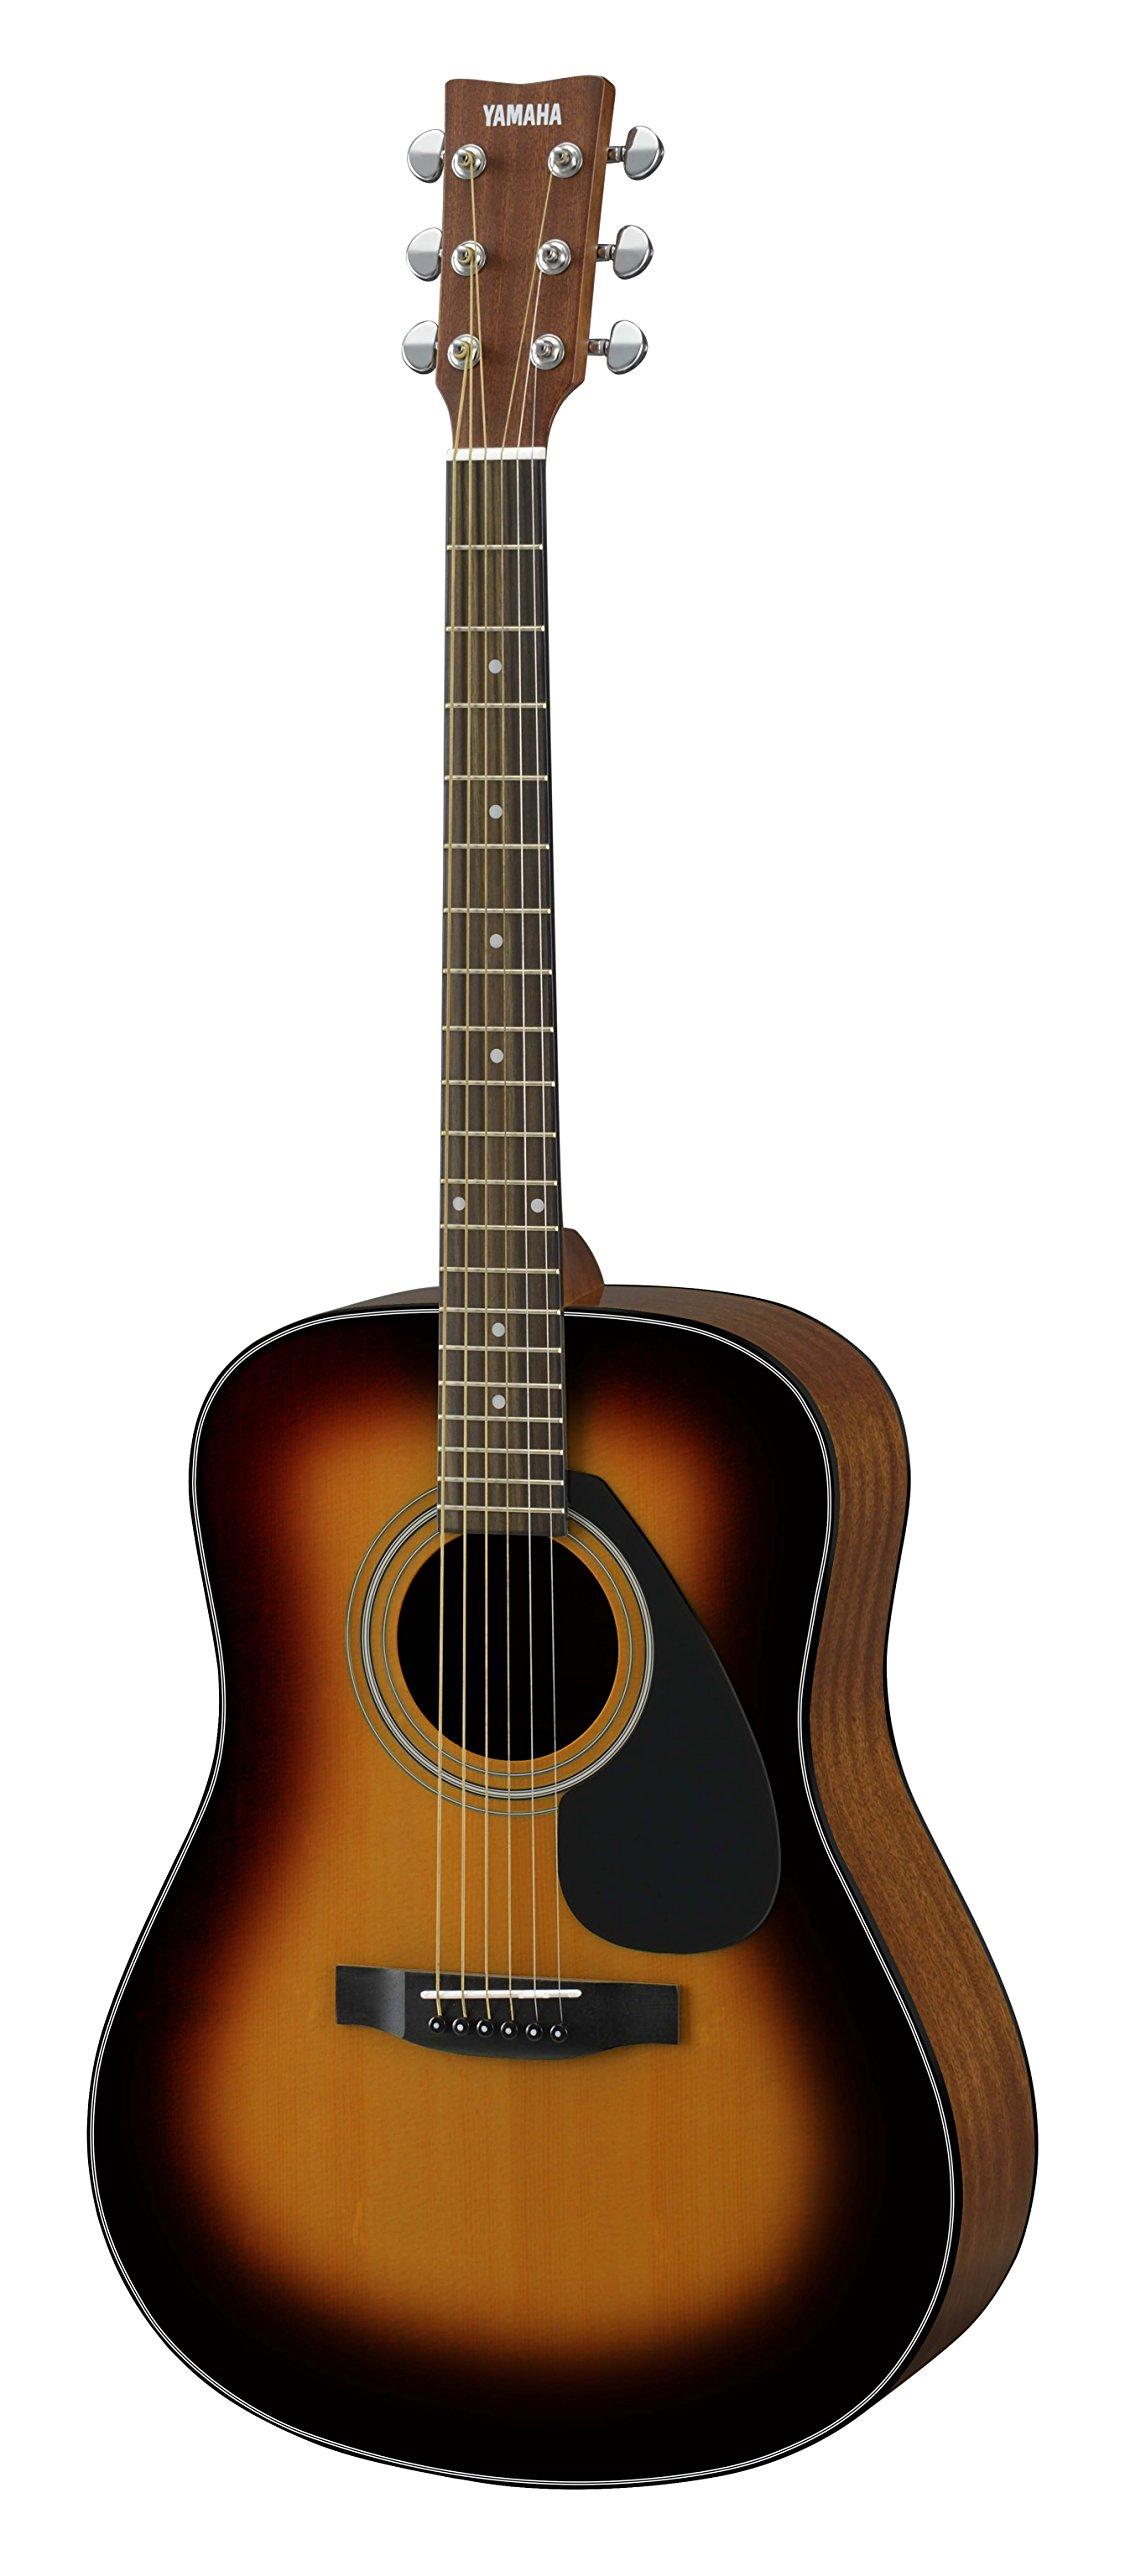 Yamaha F325D Acoustic Guitar, Tobacco Sunburst